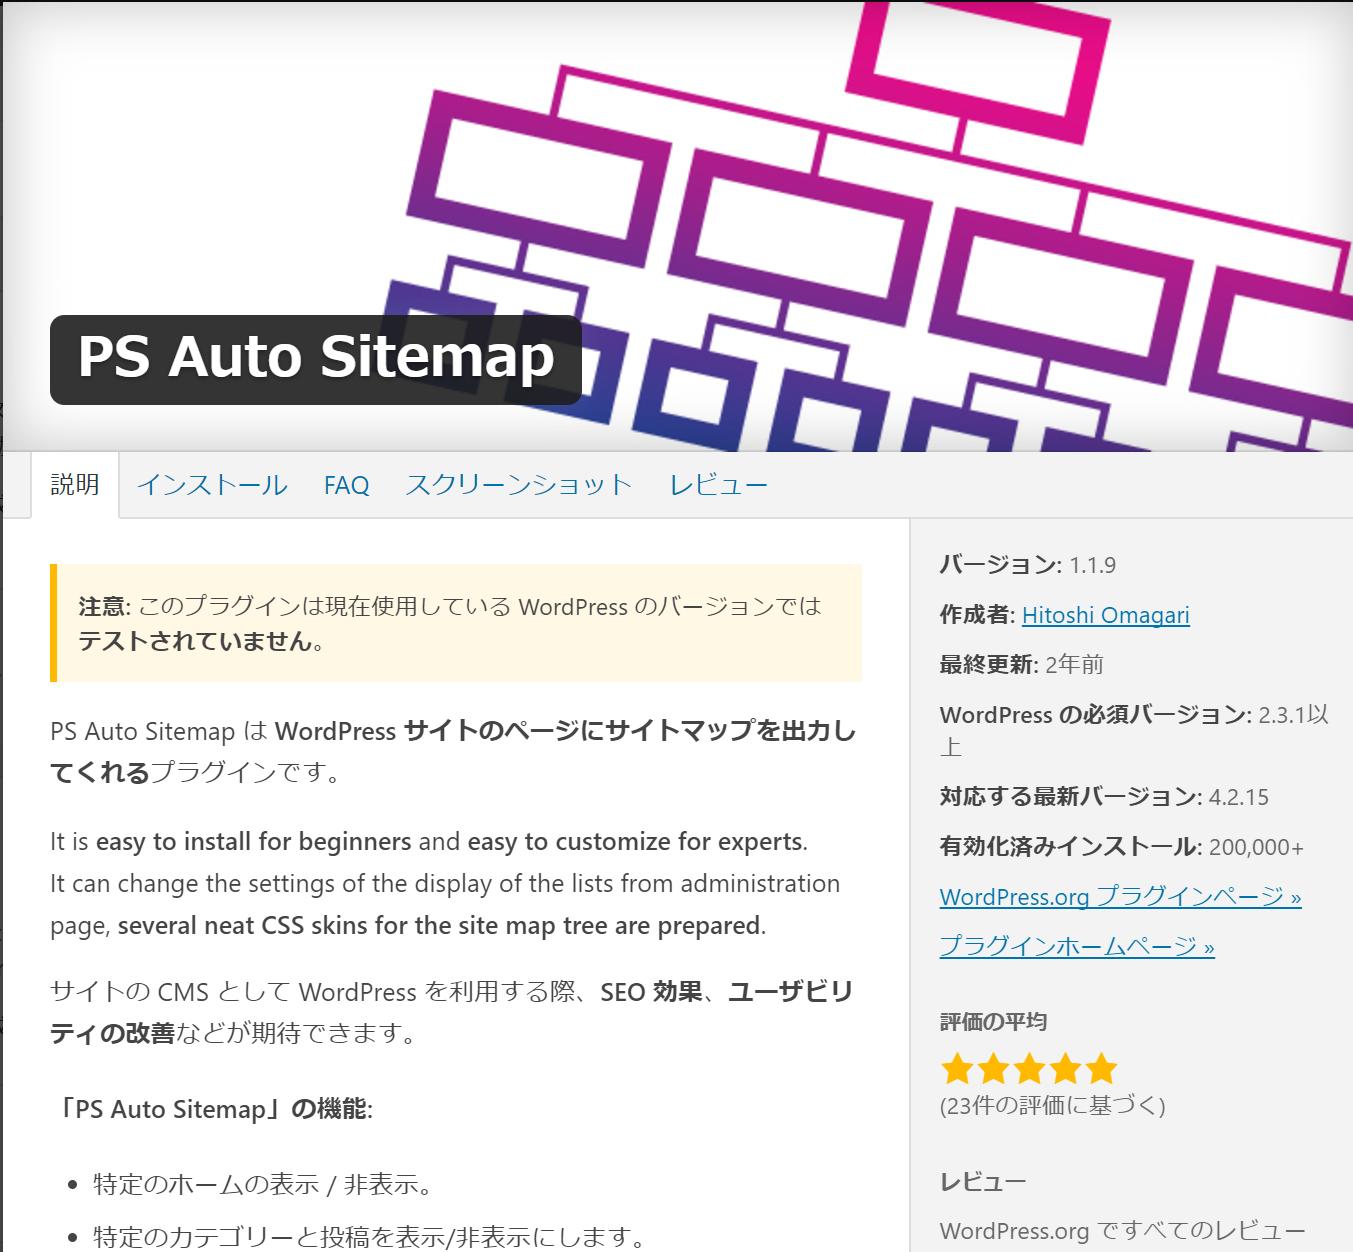 PS Auto Sitemap - WordPressのサイトマップの作成方法!おすすめプラグイン4つも紹介